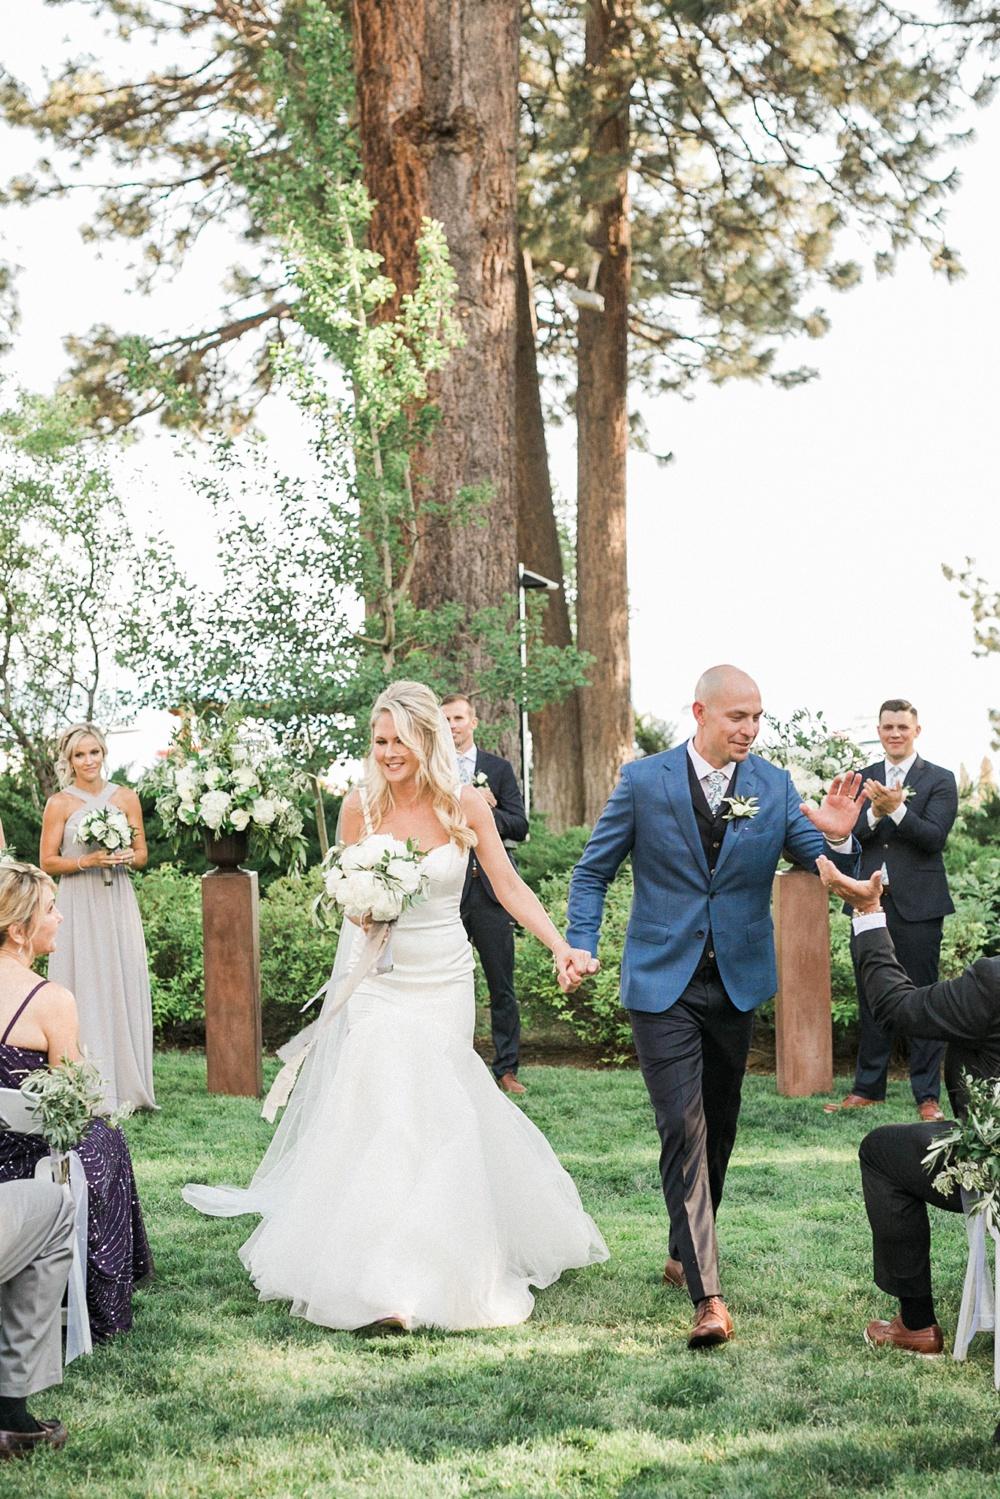 Hyatt-Lake-Tahoe-Wedding-Photographer-Regency-Mandy-Ford-Photography_0044.jpg